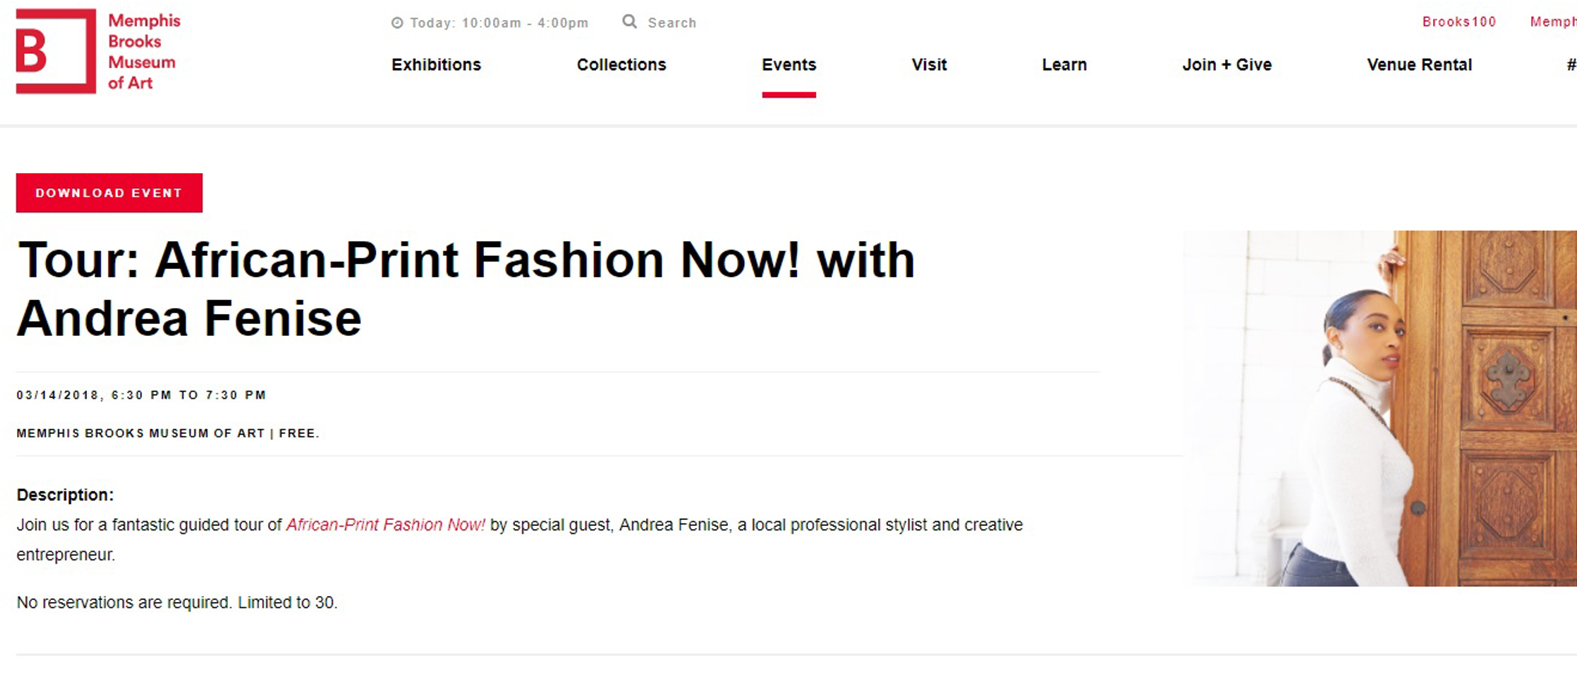 Andrea Fenise Memphis Fashion Blogger guides Memphis Brooks Museum of Art African Print Fashion Now